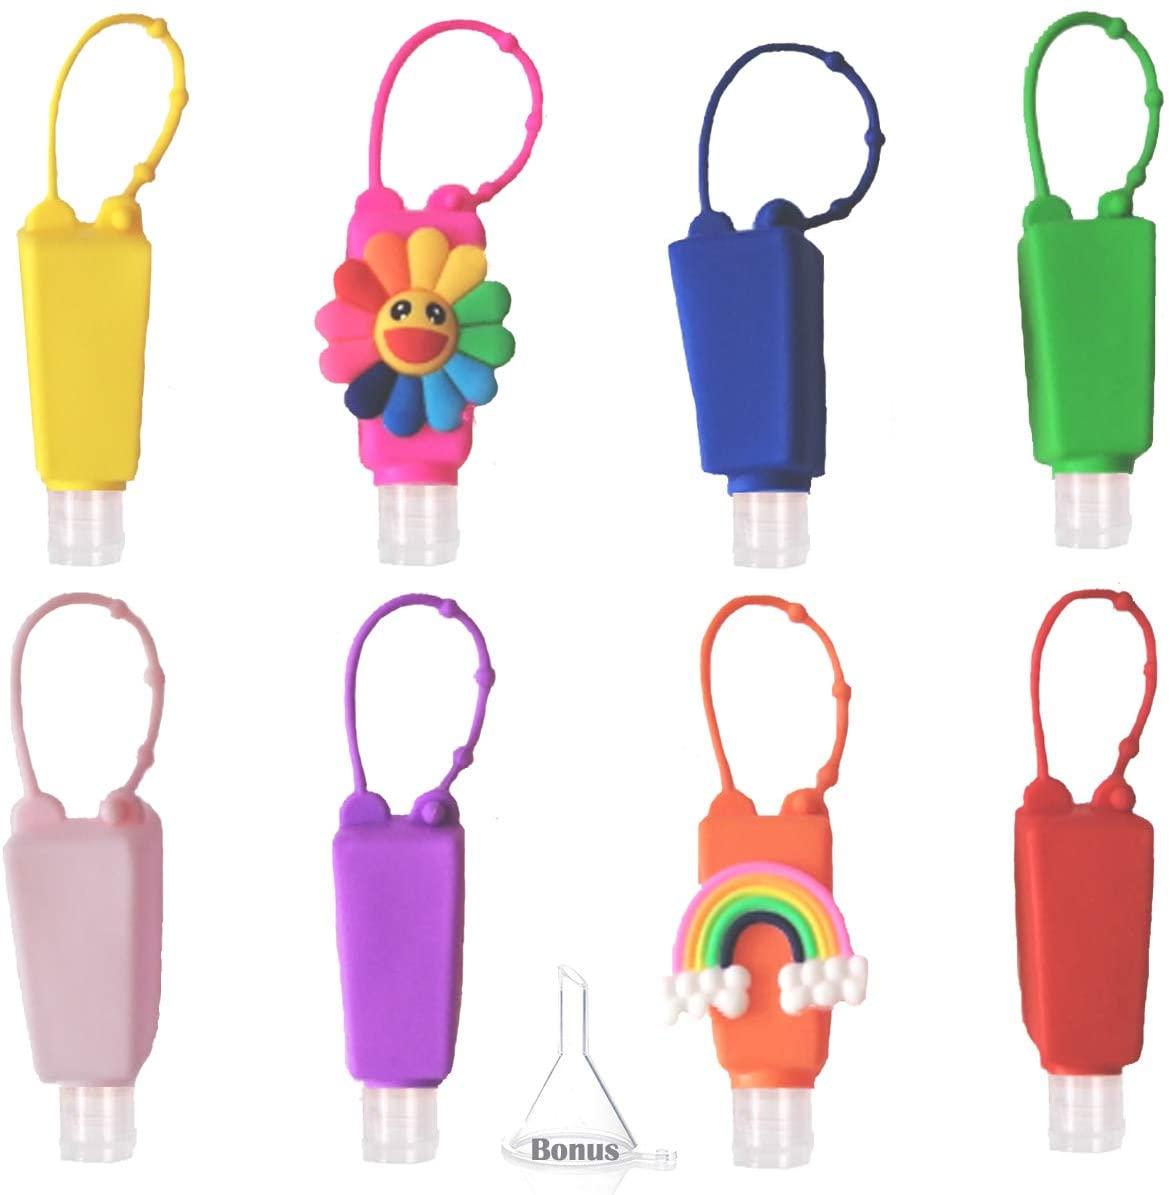 NimJoy 8PCS Empty Mixed Kids Hand Sanitizer Travel Size Holder Keychain Carriers, 8-1 fl Oz. Flip Cap Reusable Portable Bottles w/Colorful Silicone Case